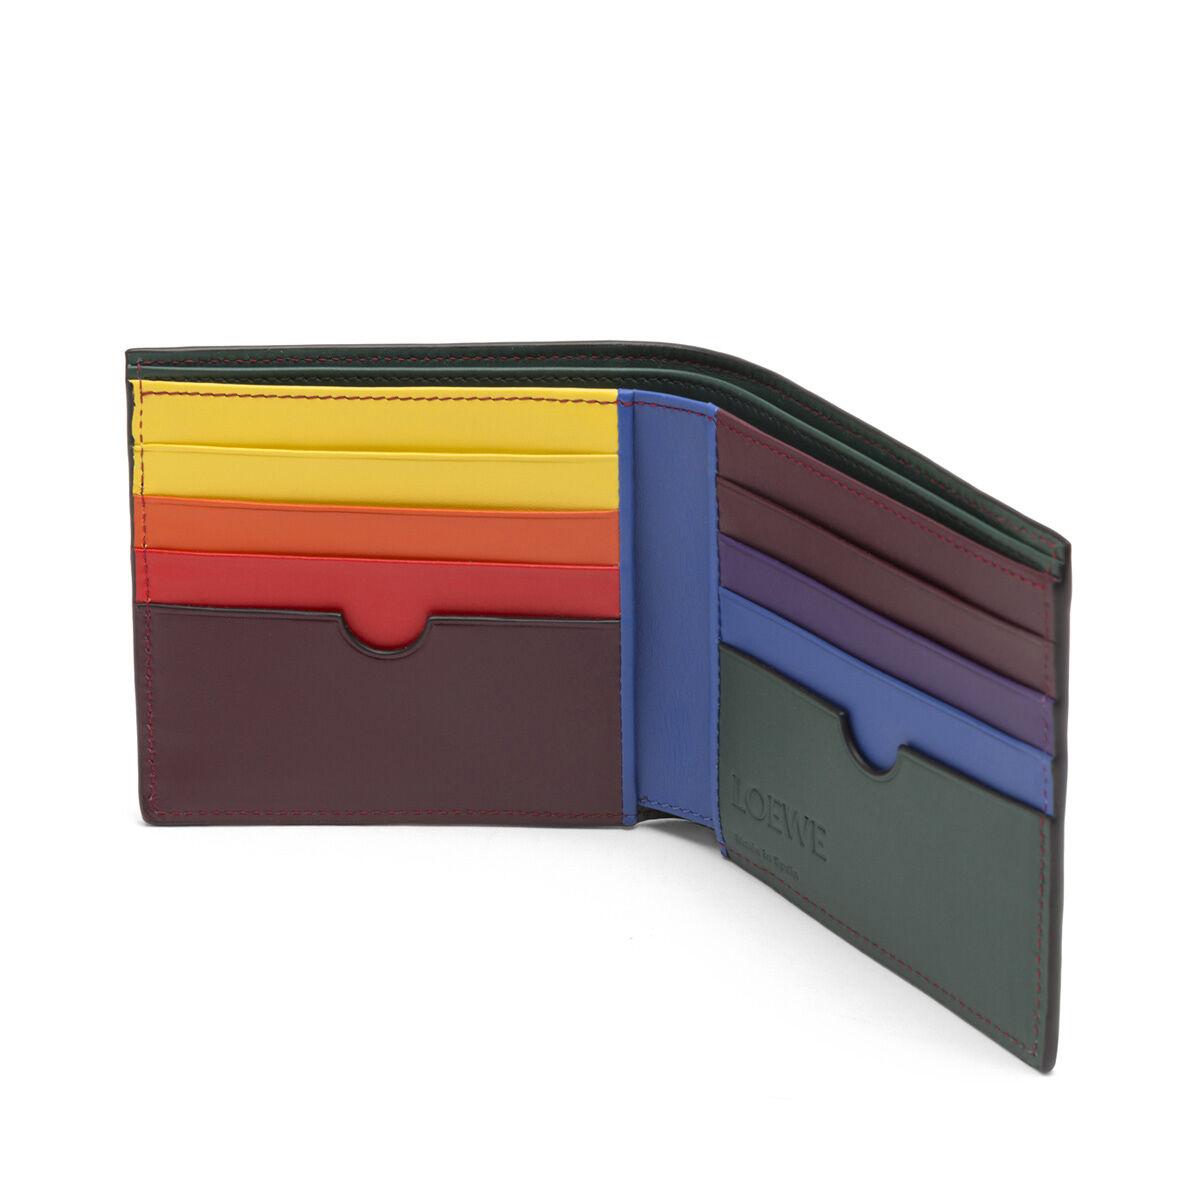 LOEWE Rainbow Bifold Wallet Multicolor/Black front